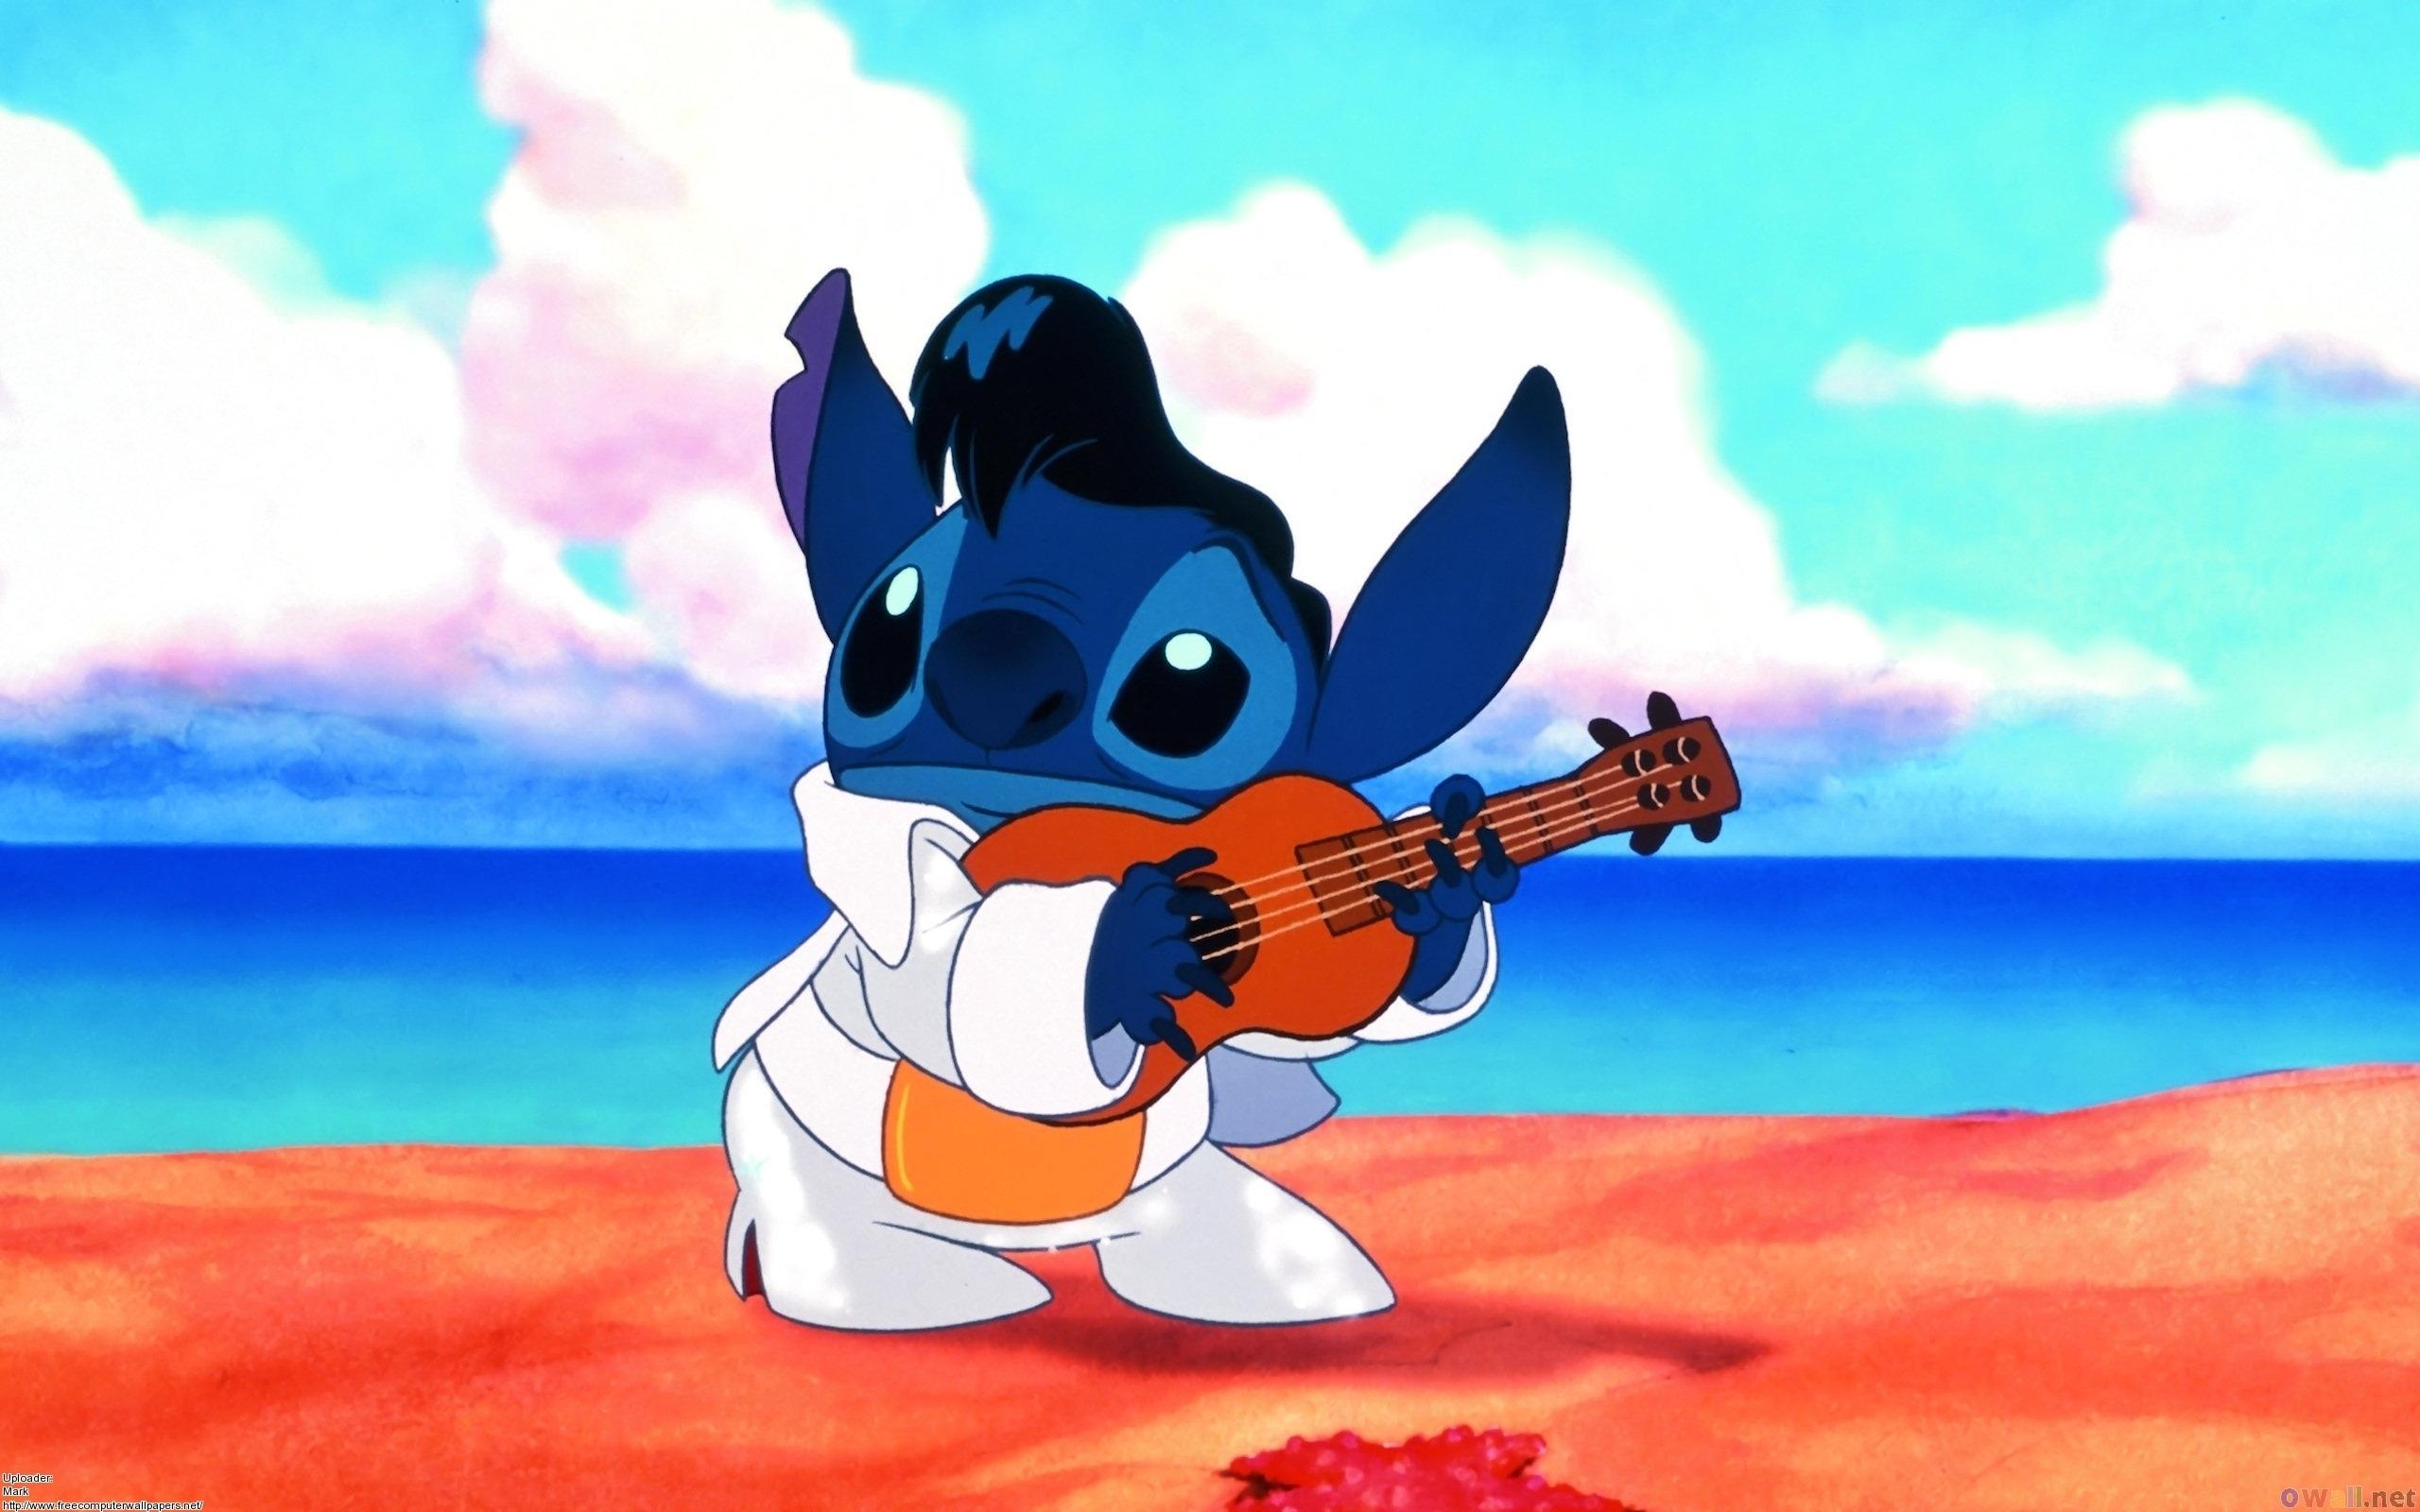 Disney Lilo Stitch Guitar Cartoons wallpaper background 2560x1600